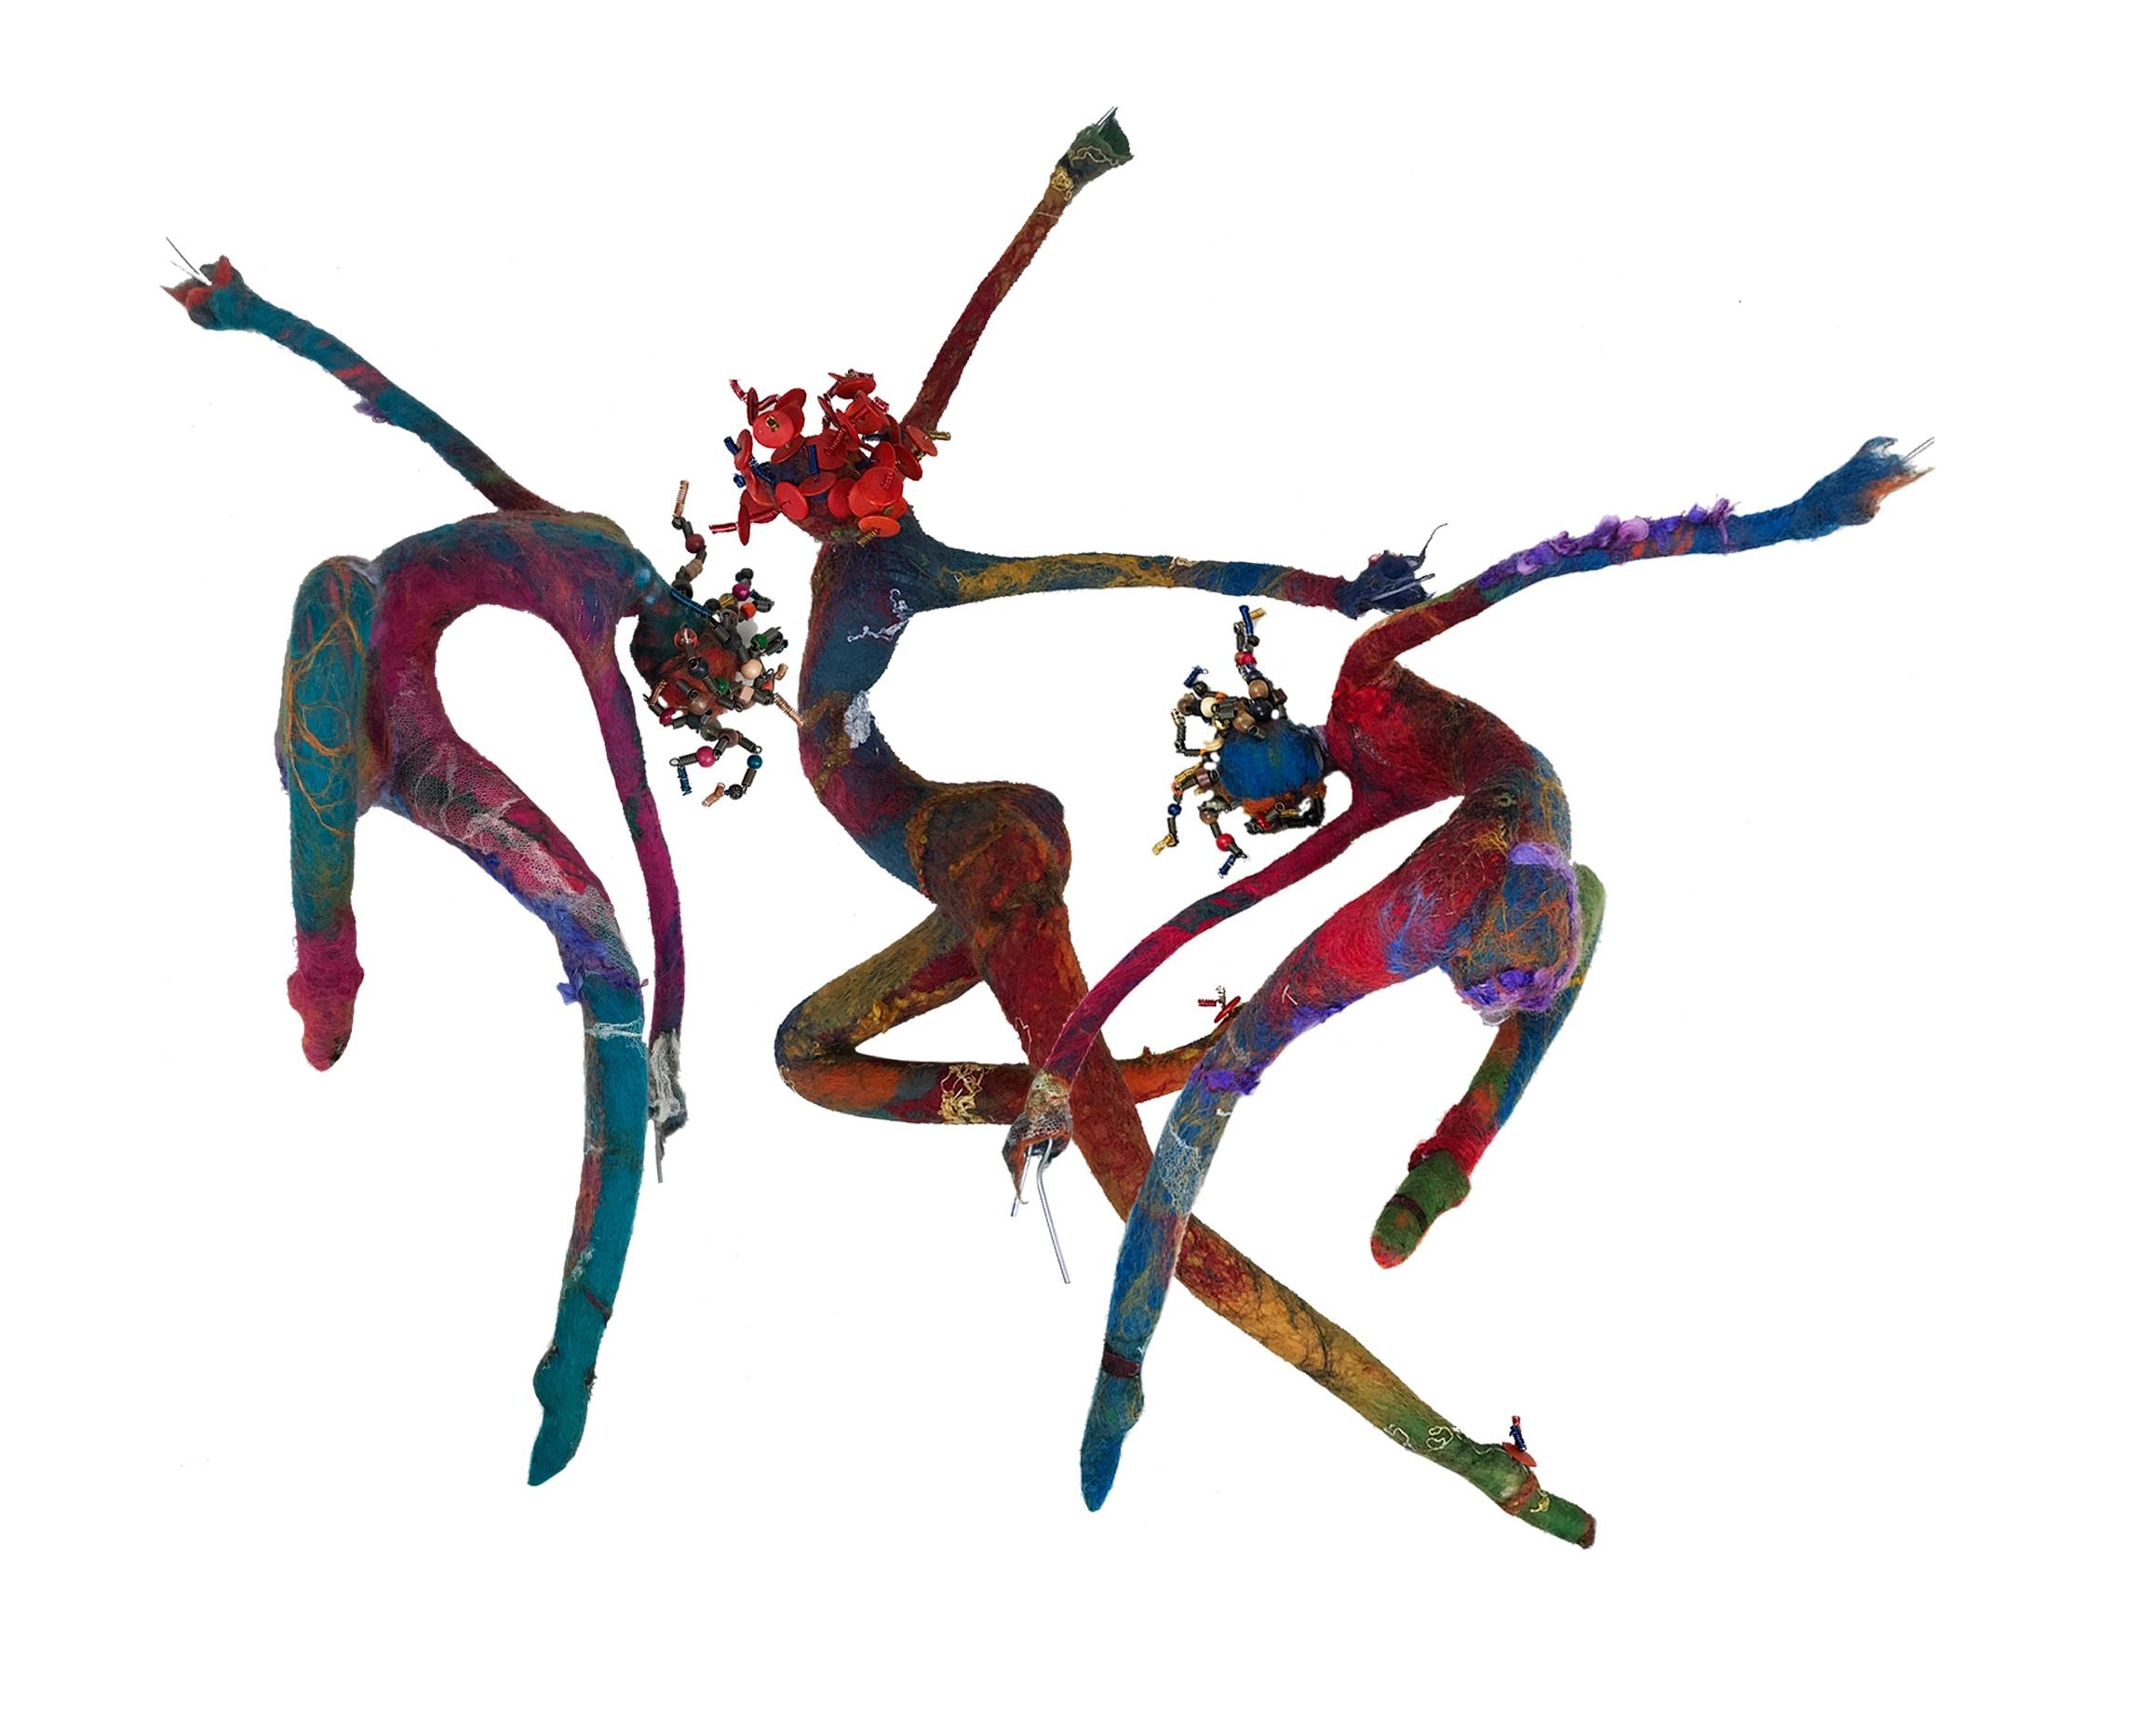 molly williams felt sculture online course 2010